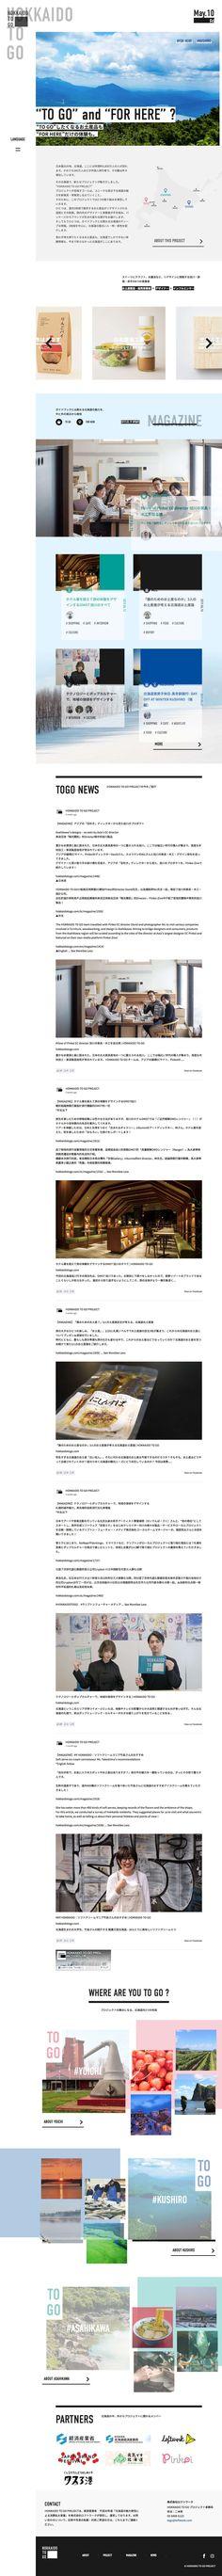 e525eaf939c5 HOKKAIDO TO GO. HOKKAIDO TO GO / webデザイナーのためのギャラリー・サイトリンク集 ...